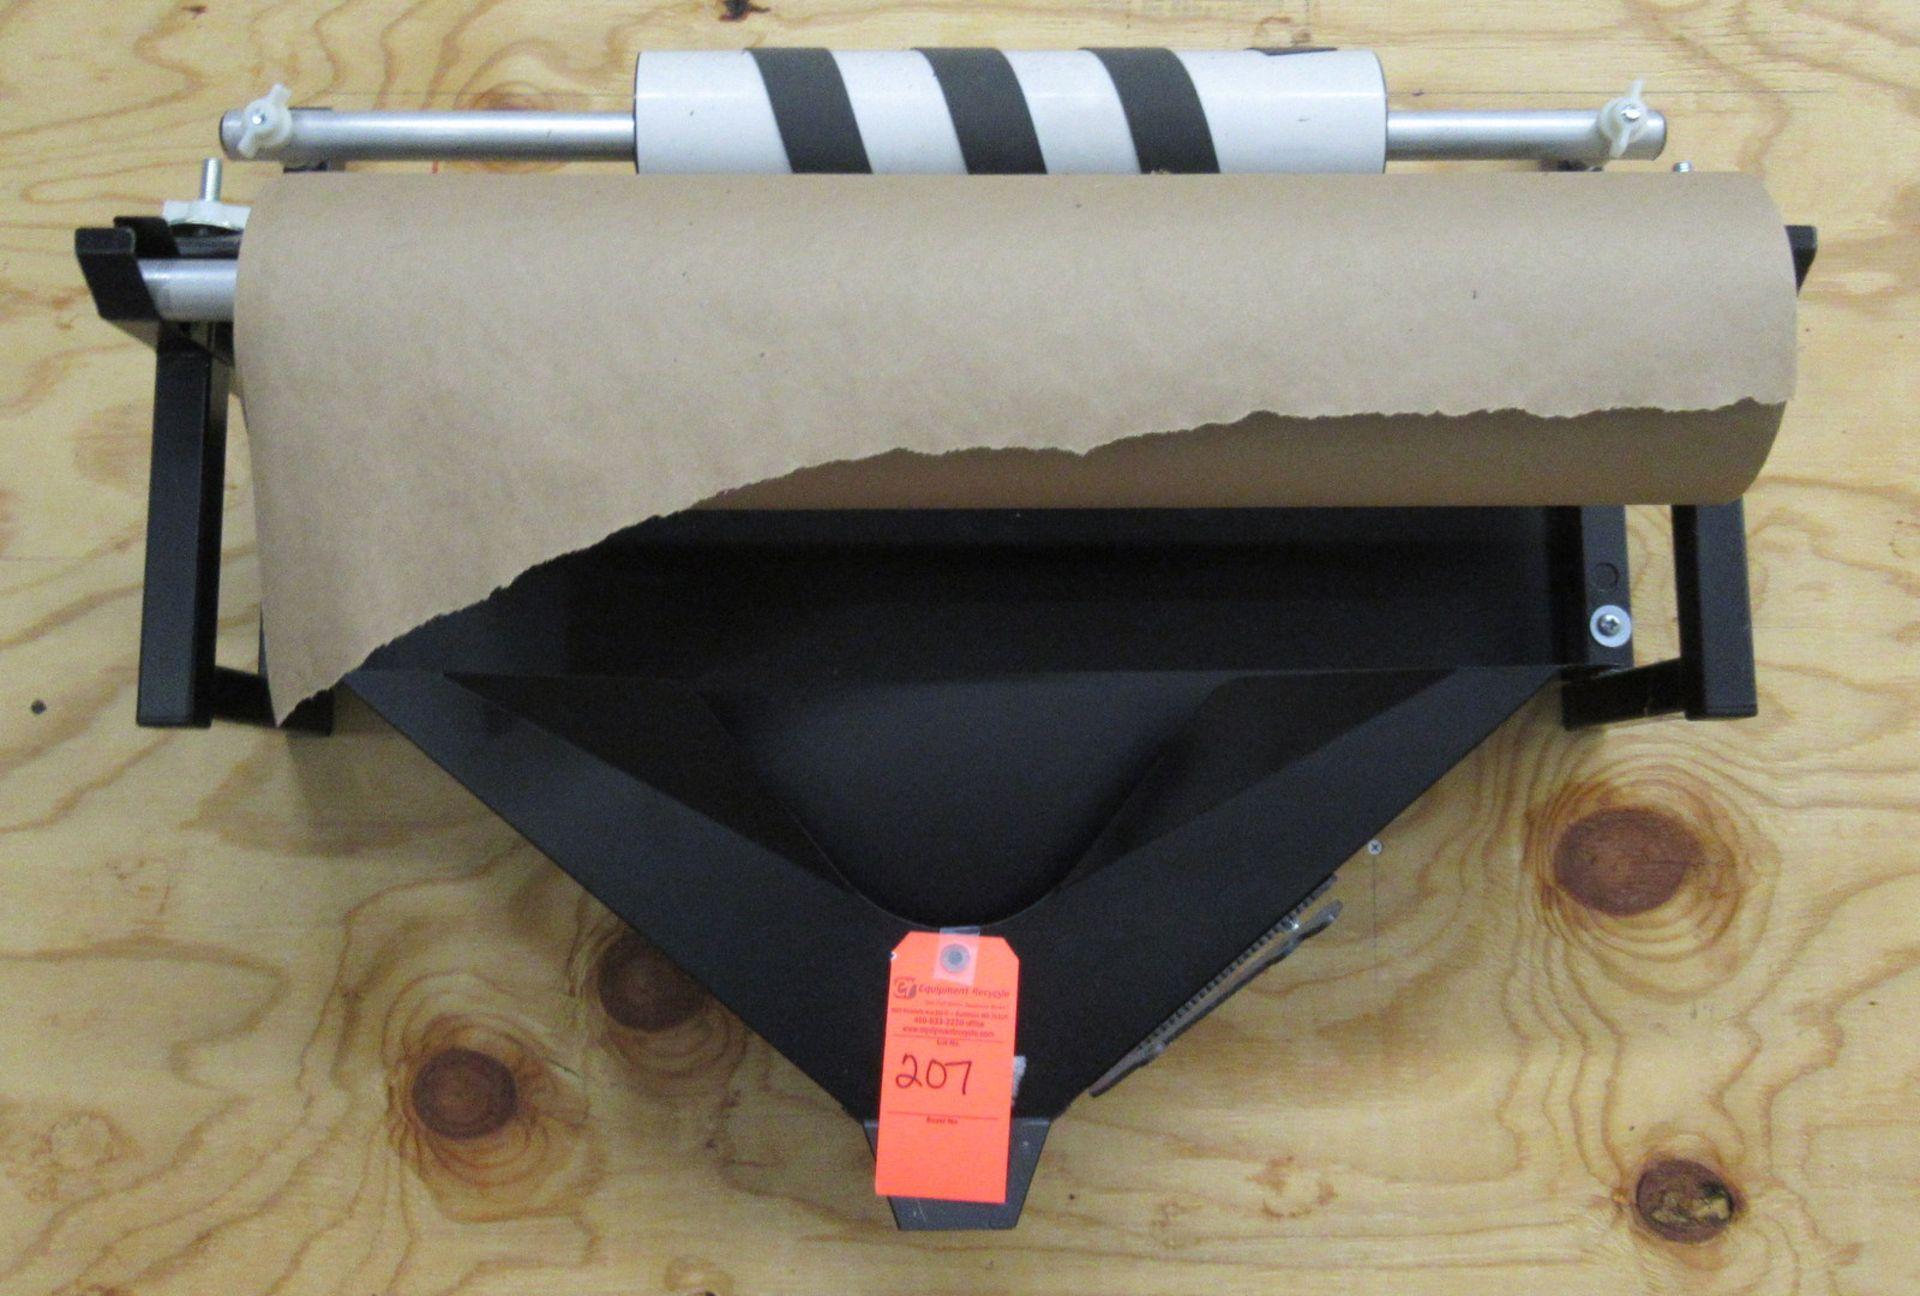 Lot 207 - Paper Dispenser & Bubble Wrap Bars